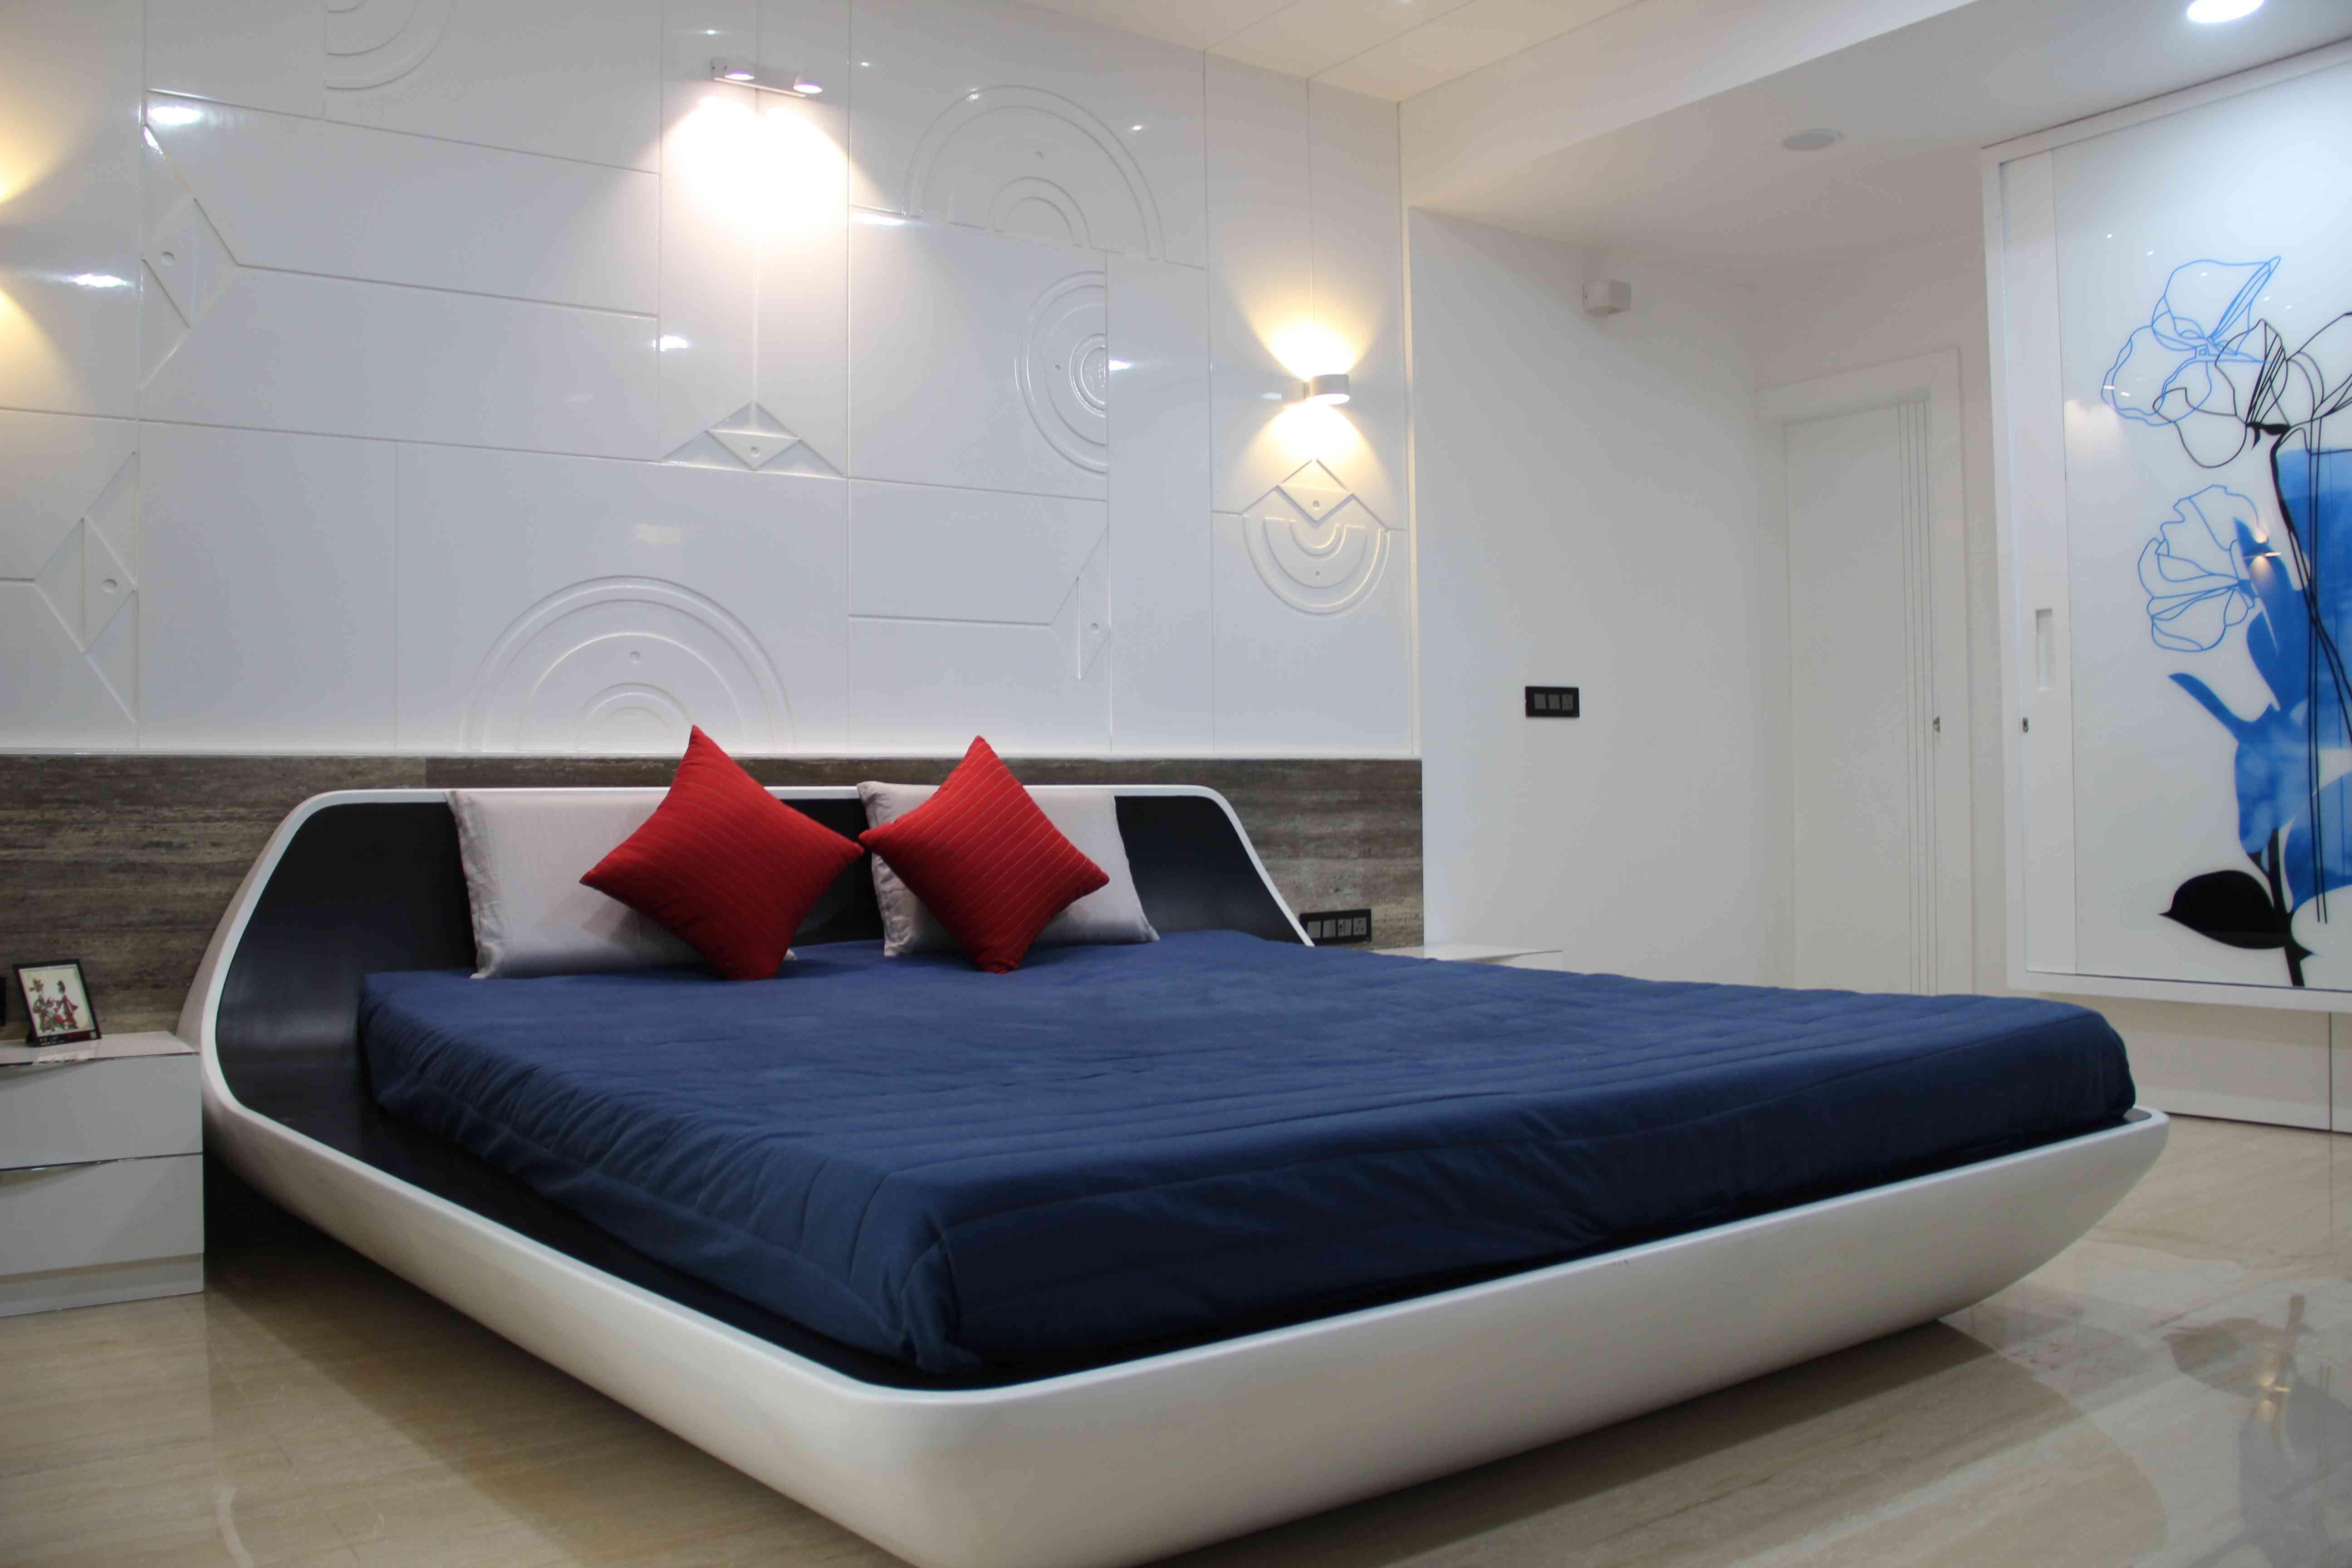 Design Malvi Gajjar Wallpaper Design For Bedroom Contemporary